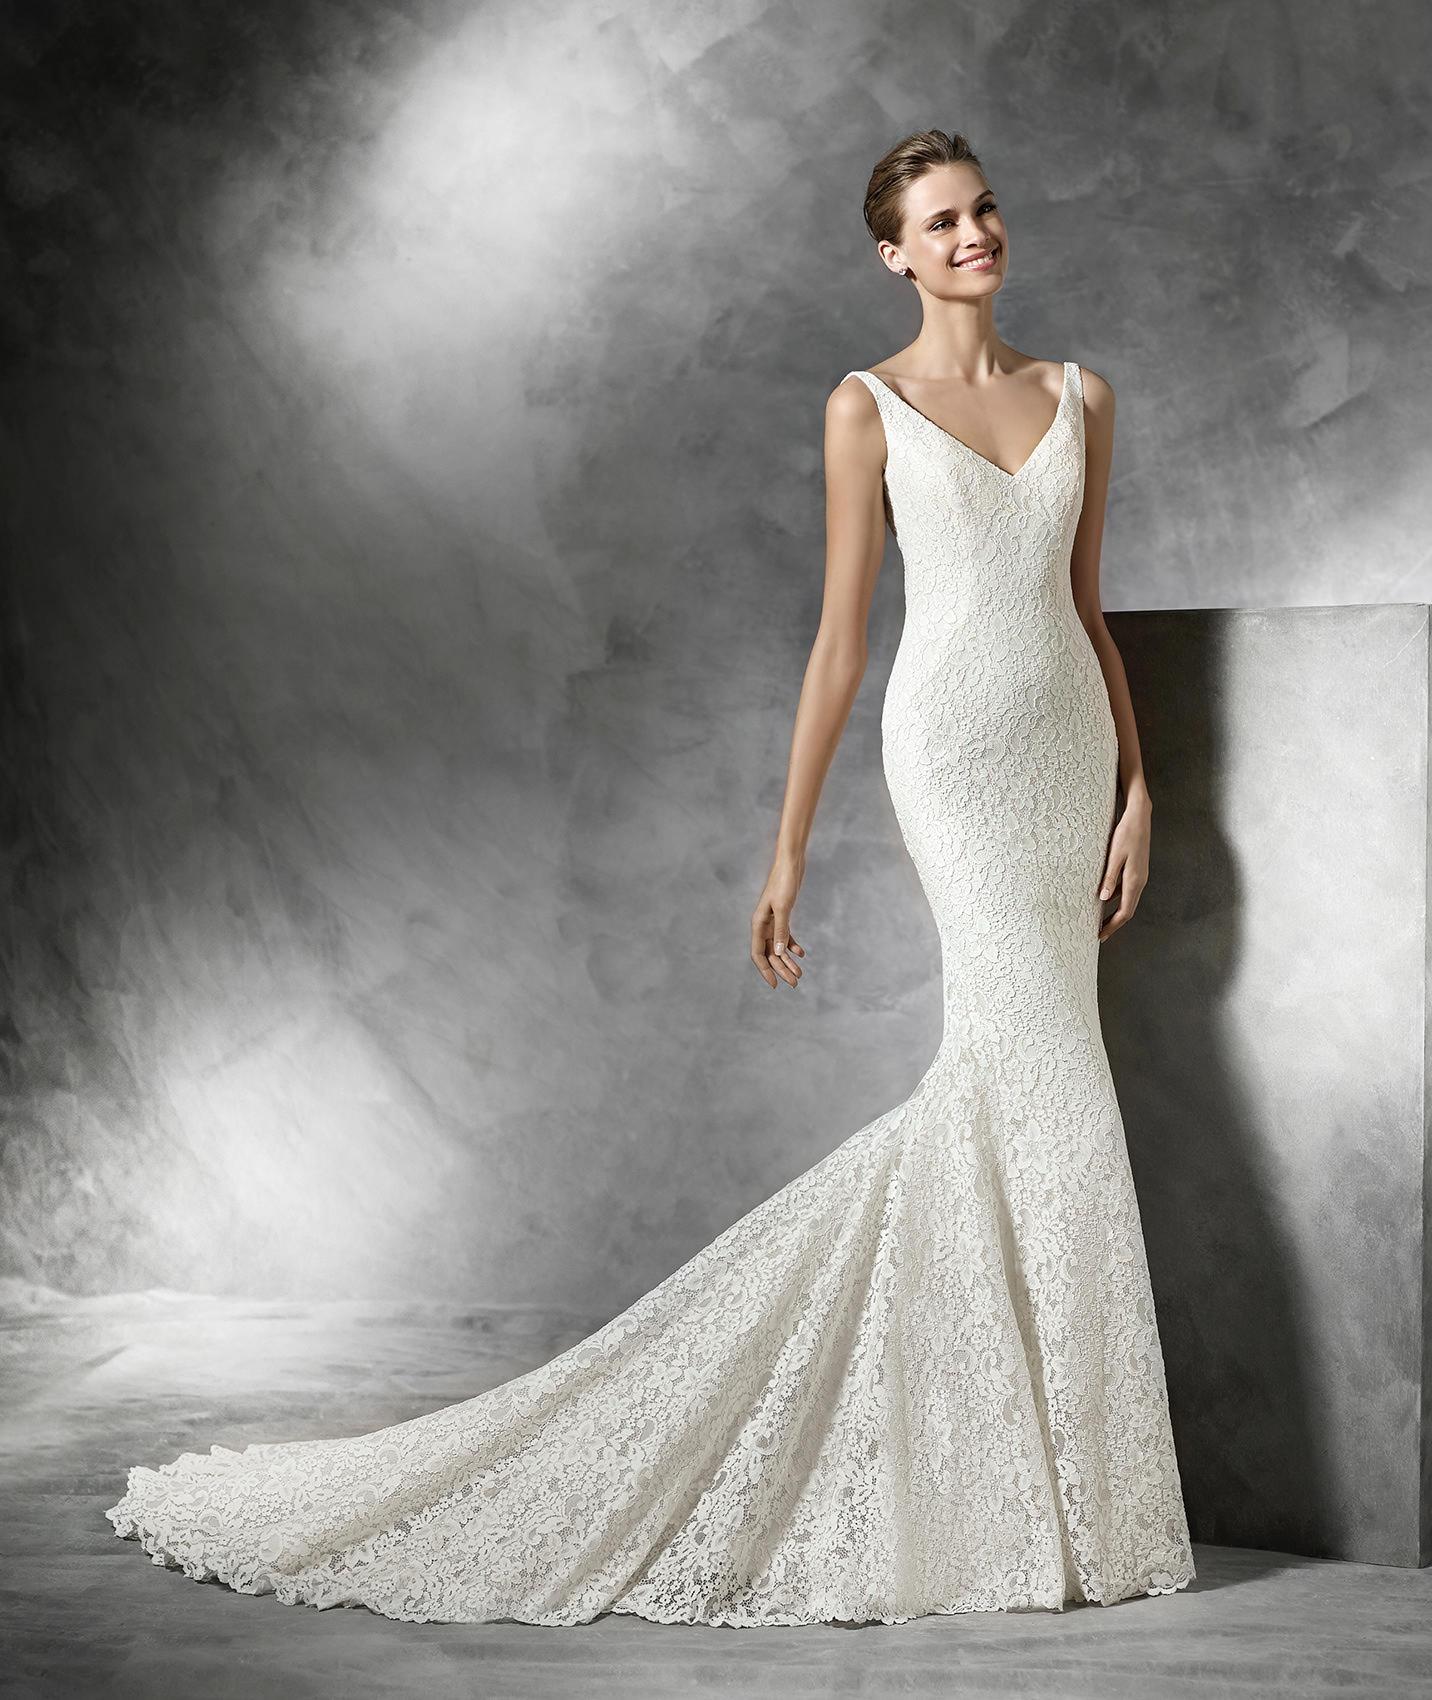 Pronovias Wedding Dresses Prices